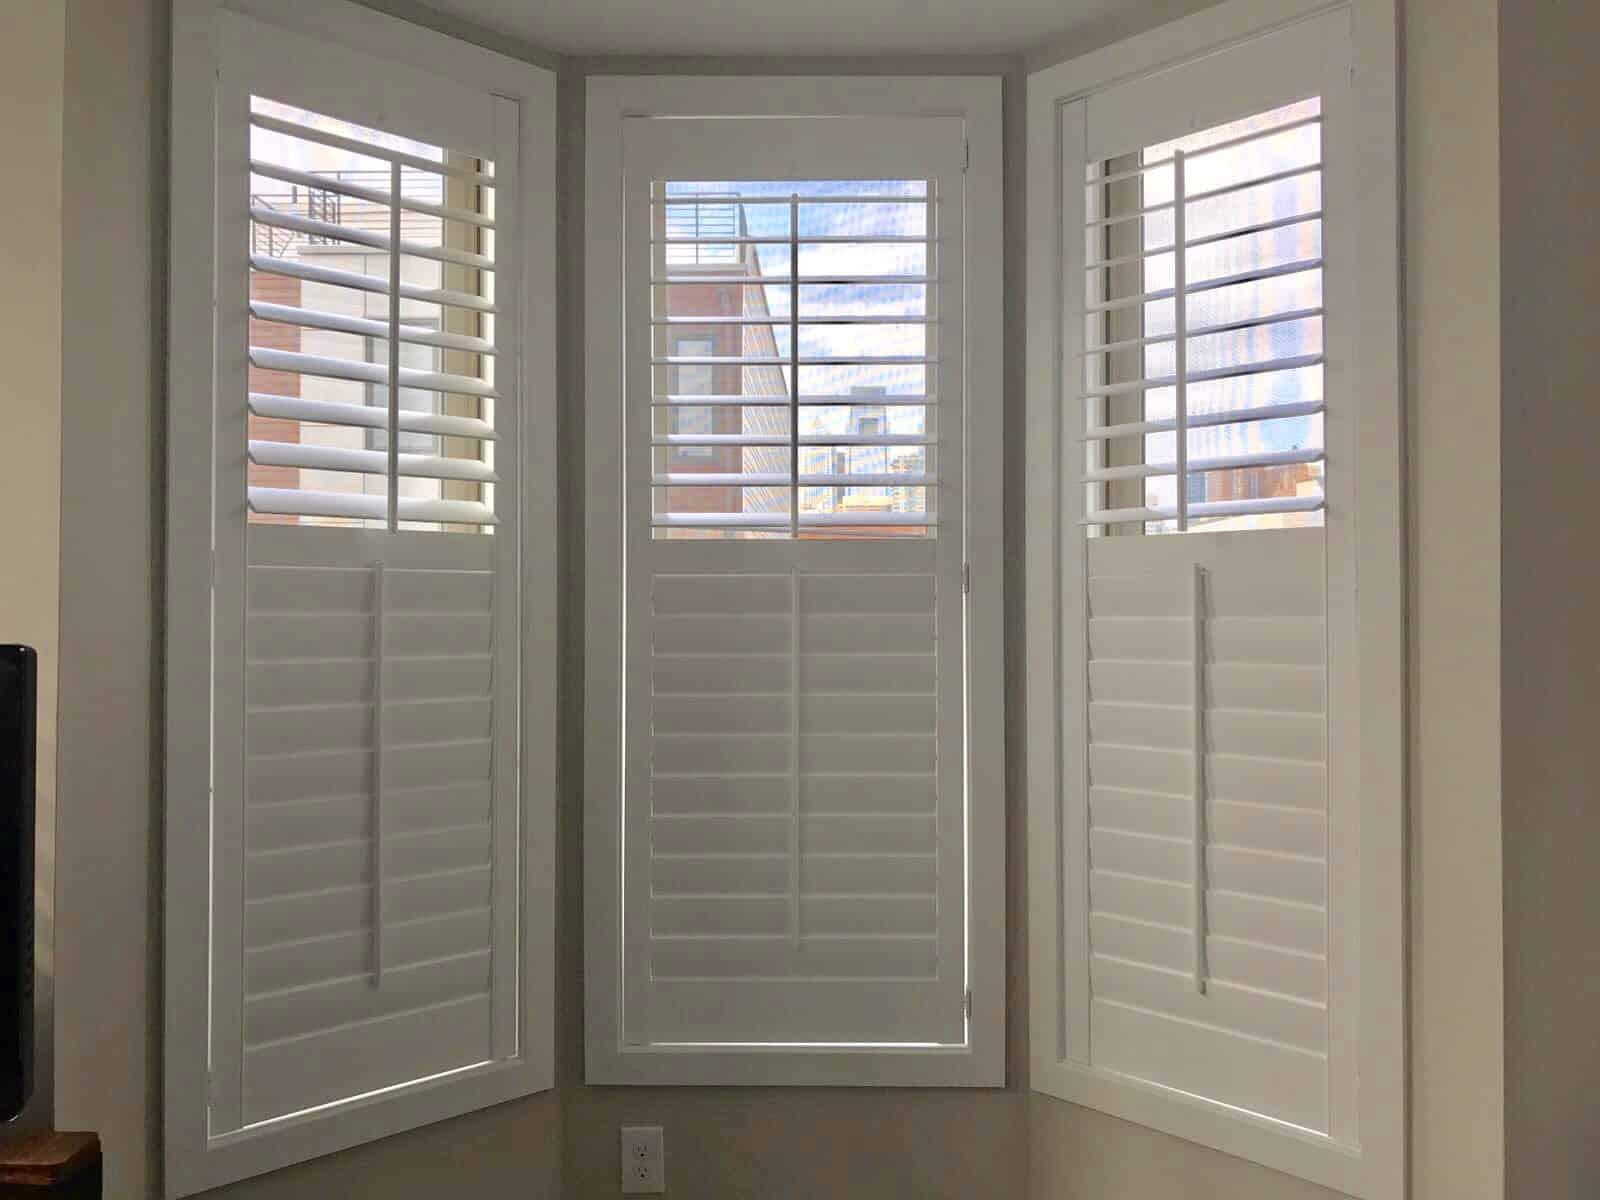 Do Plantation Shutters Make Rooms Dark Blinds Brothers